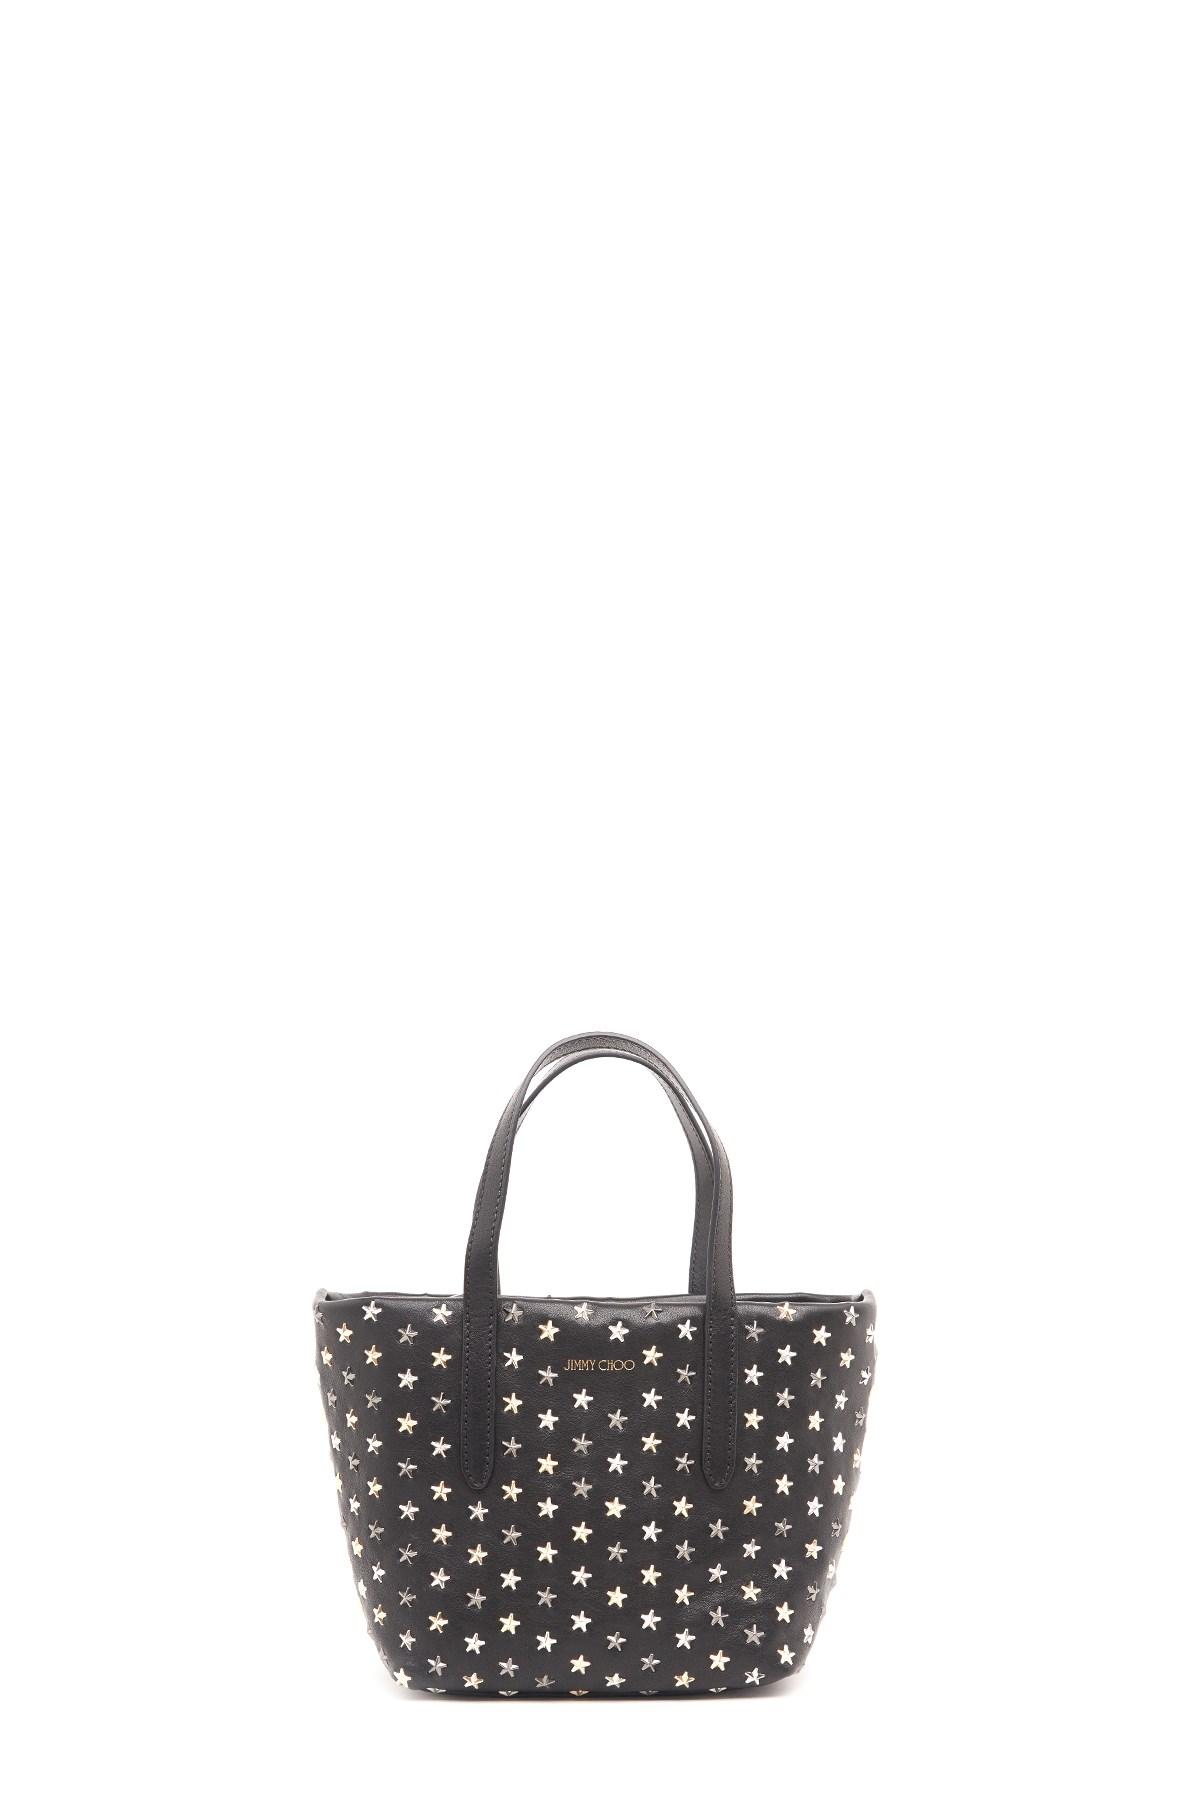 e160e7040d5 jimmy choo  mini sara  hand bag available on julian-fashion.com - 49921